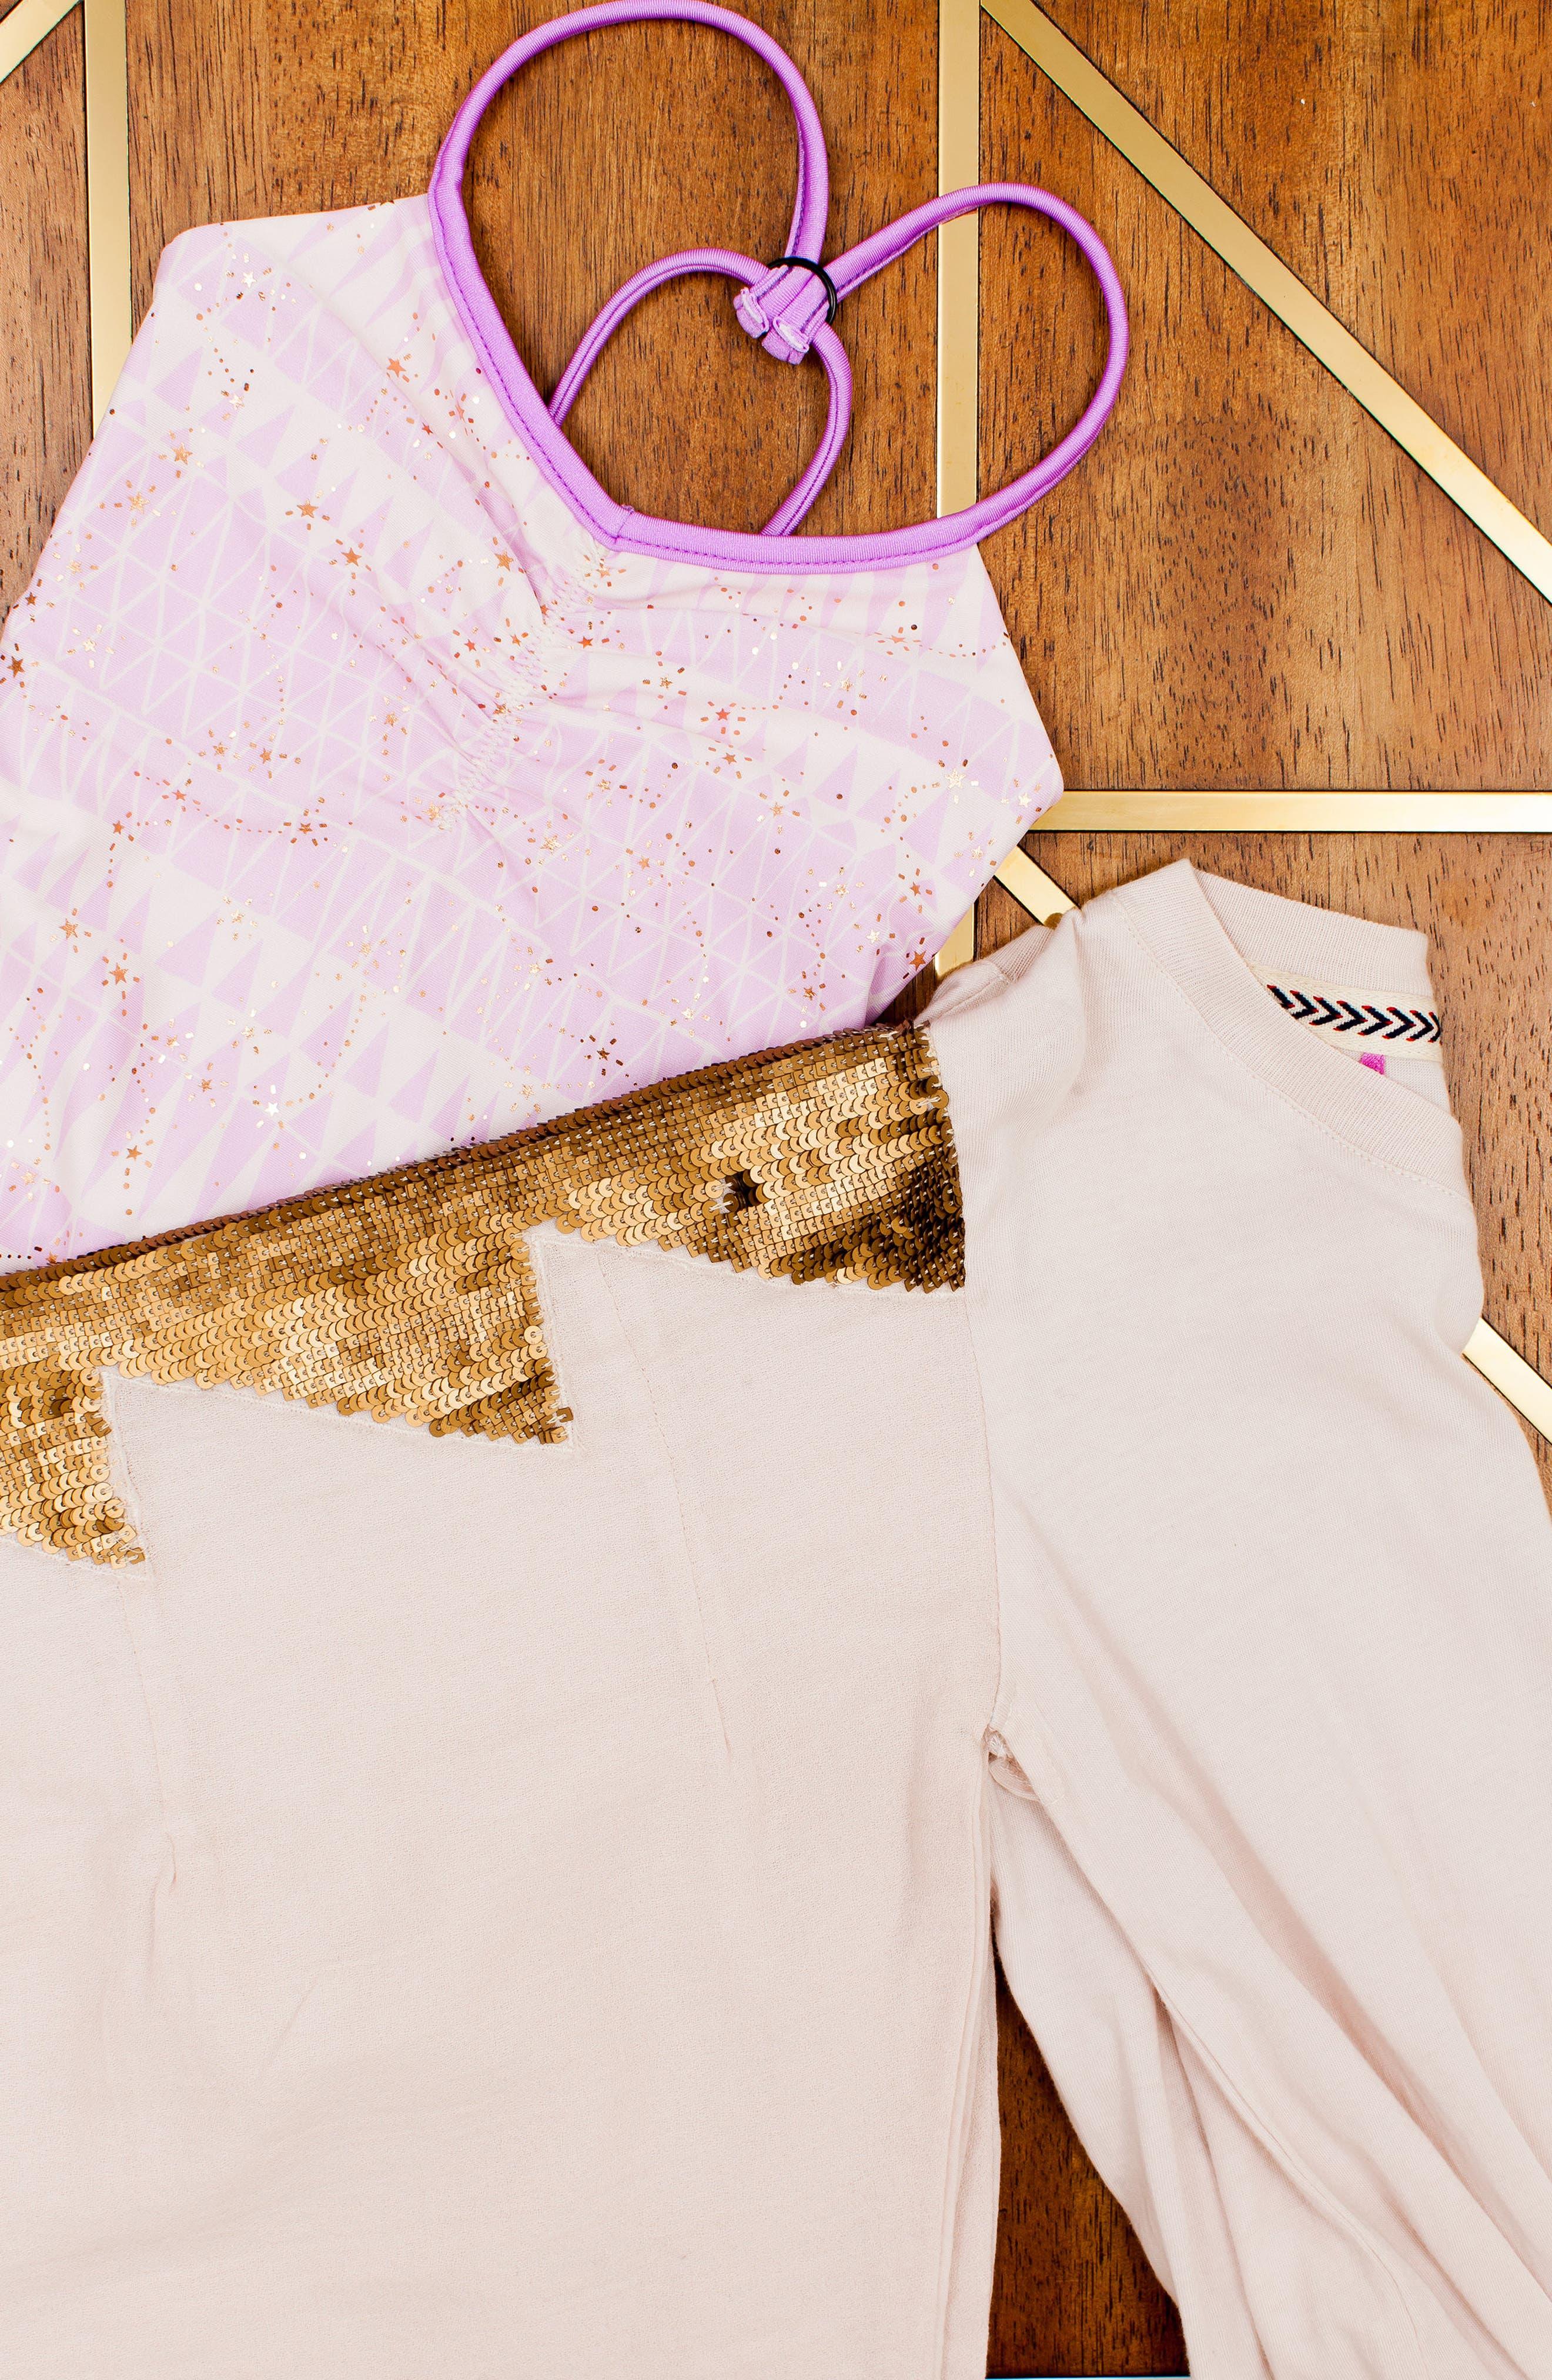 BOWIE X JAMES,                             Catalinakini One-Piece Reversible Swimsuit,                             Alternate thumbnail 6, color,                             LAVENDER